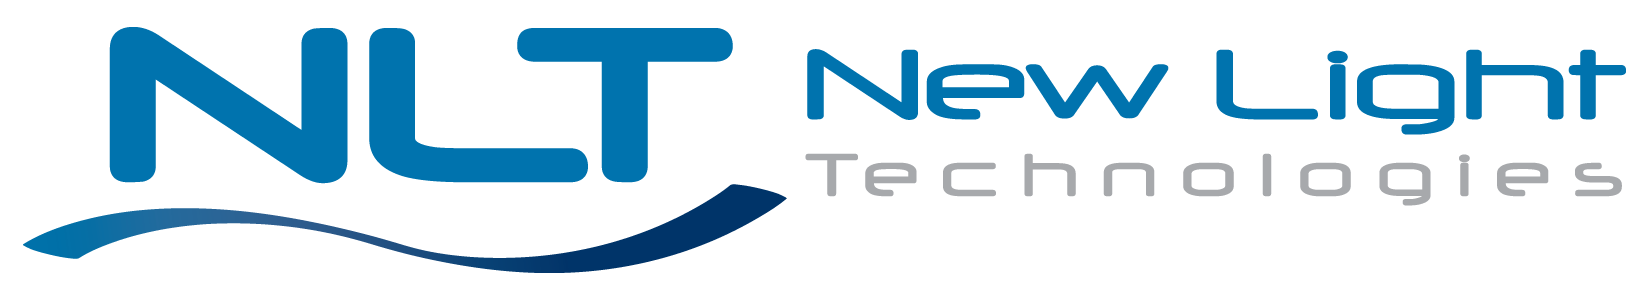 new-light-technologies-logo